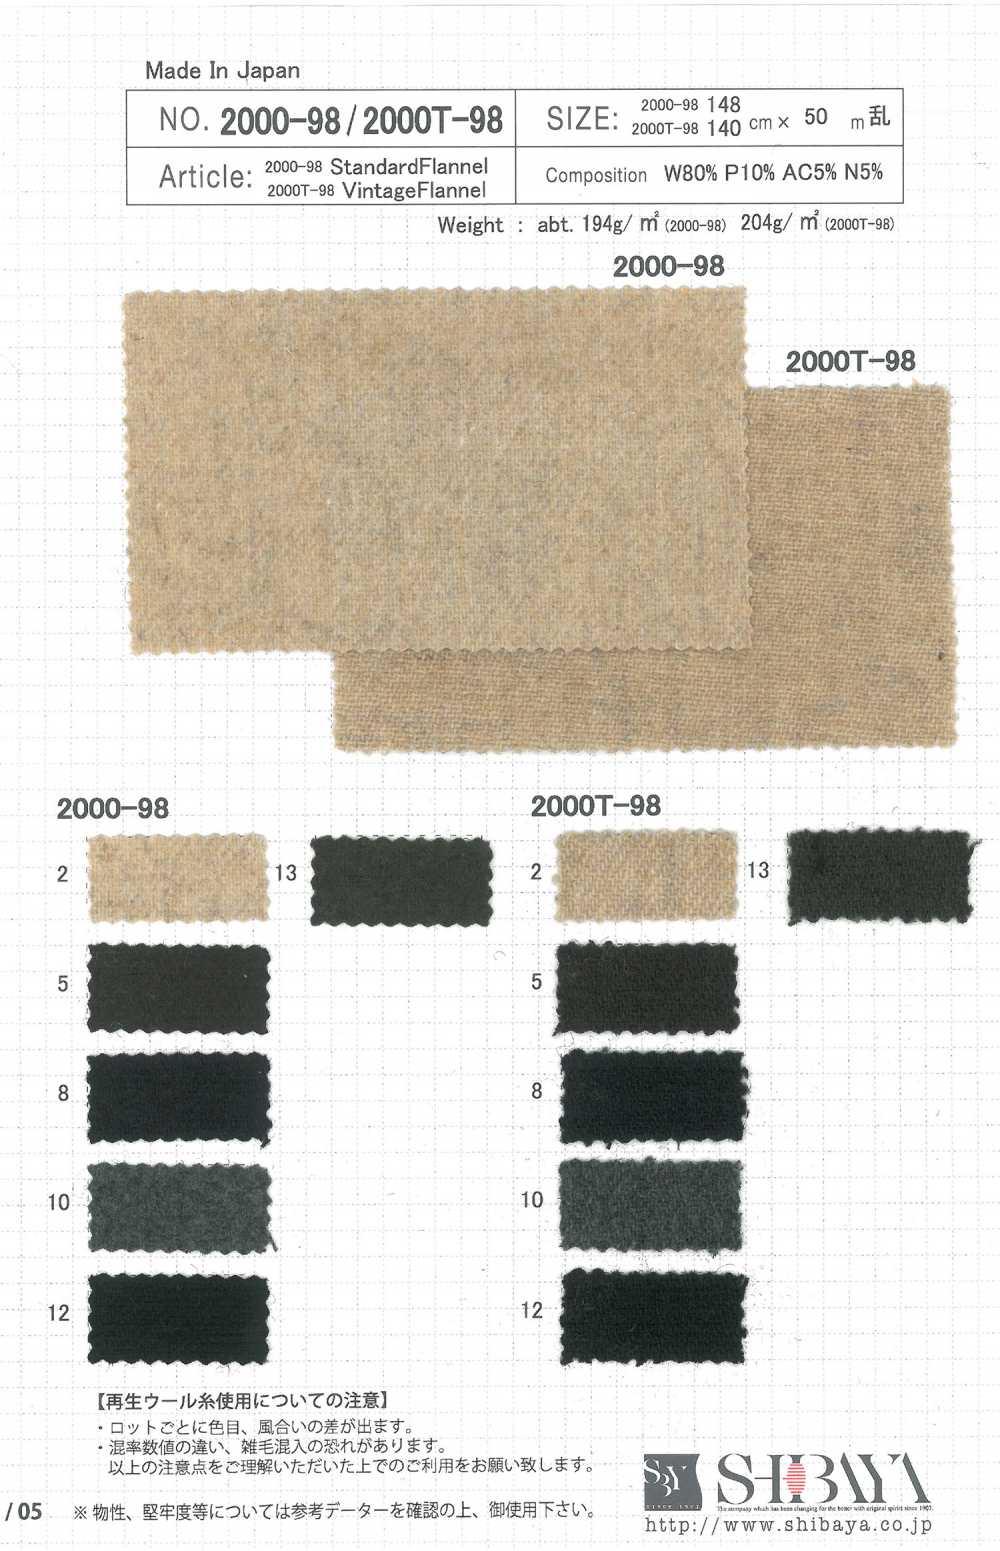 2000T-98 Vintage Flannel[生地] 柴屋/オークラ商事 - ApparelX アパレル資材卸通販